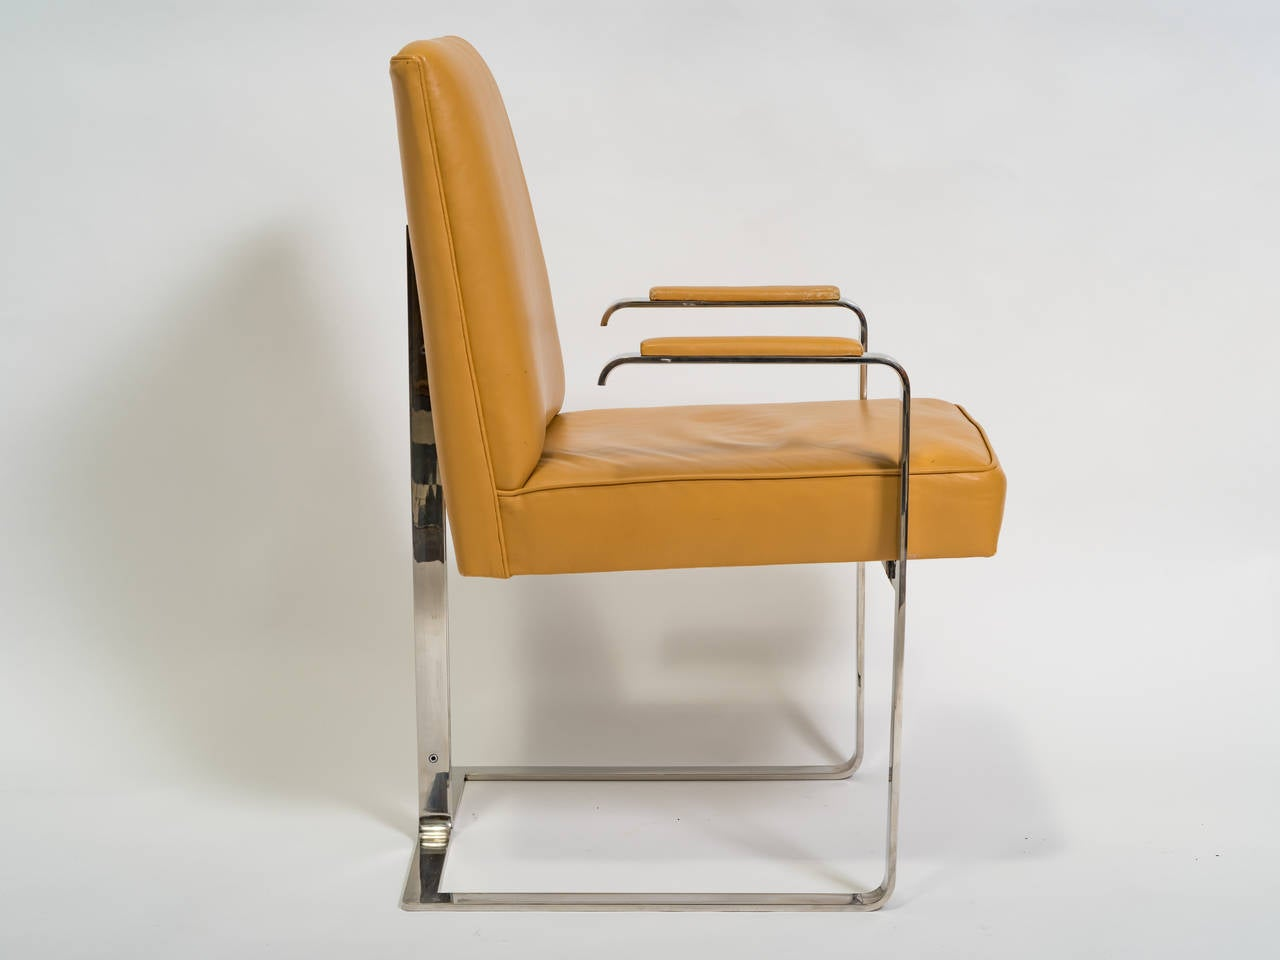 Vladimir Kagan Chrome and Leather Chair For Sale 2